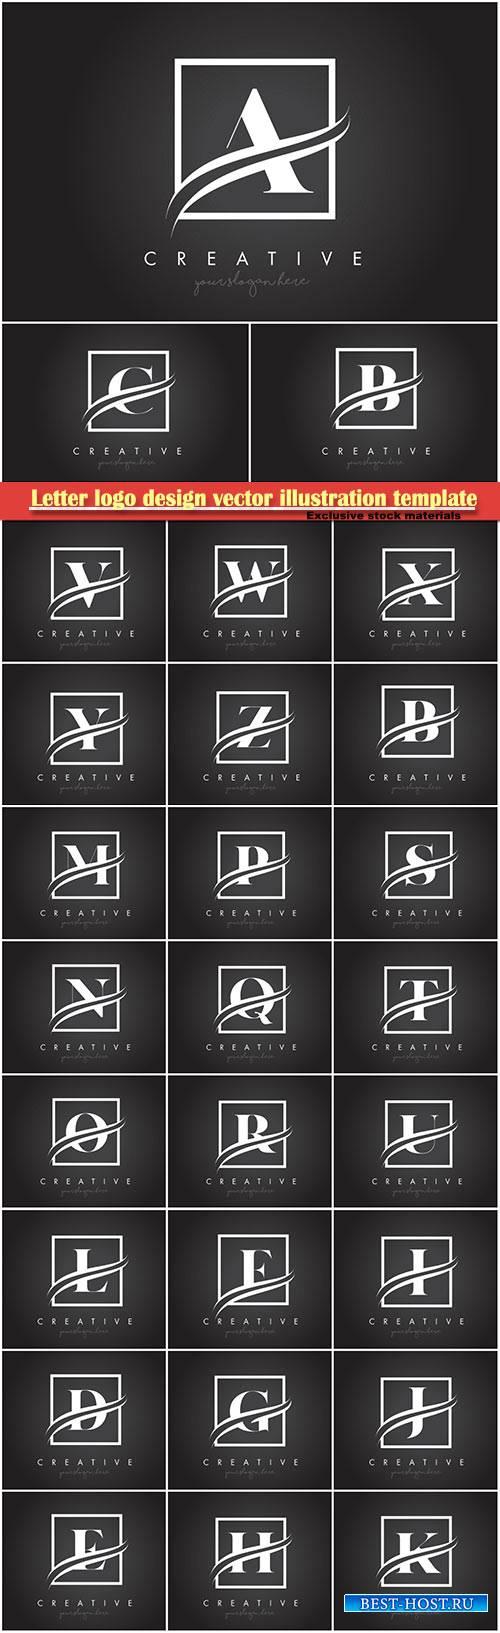 Letter logo design vector illustration template # 6